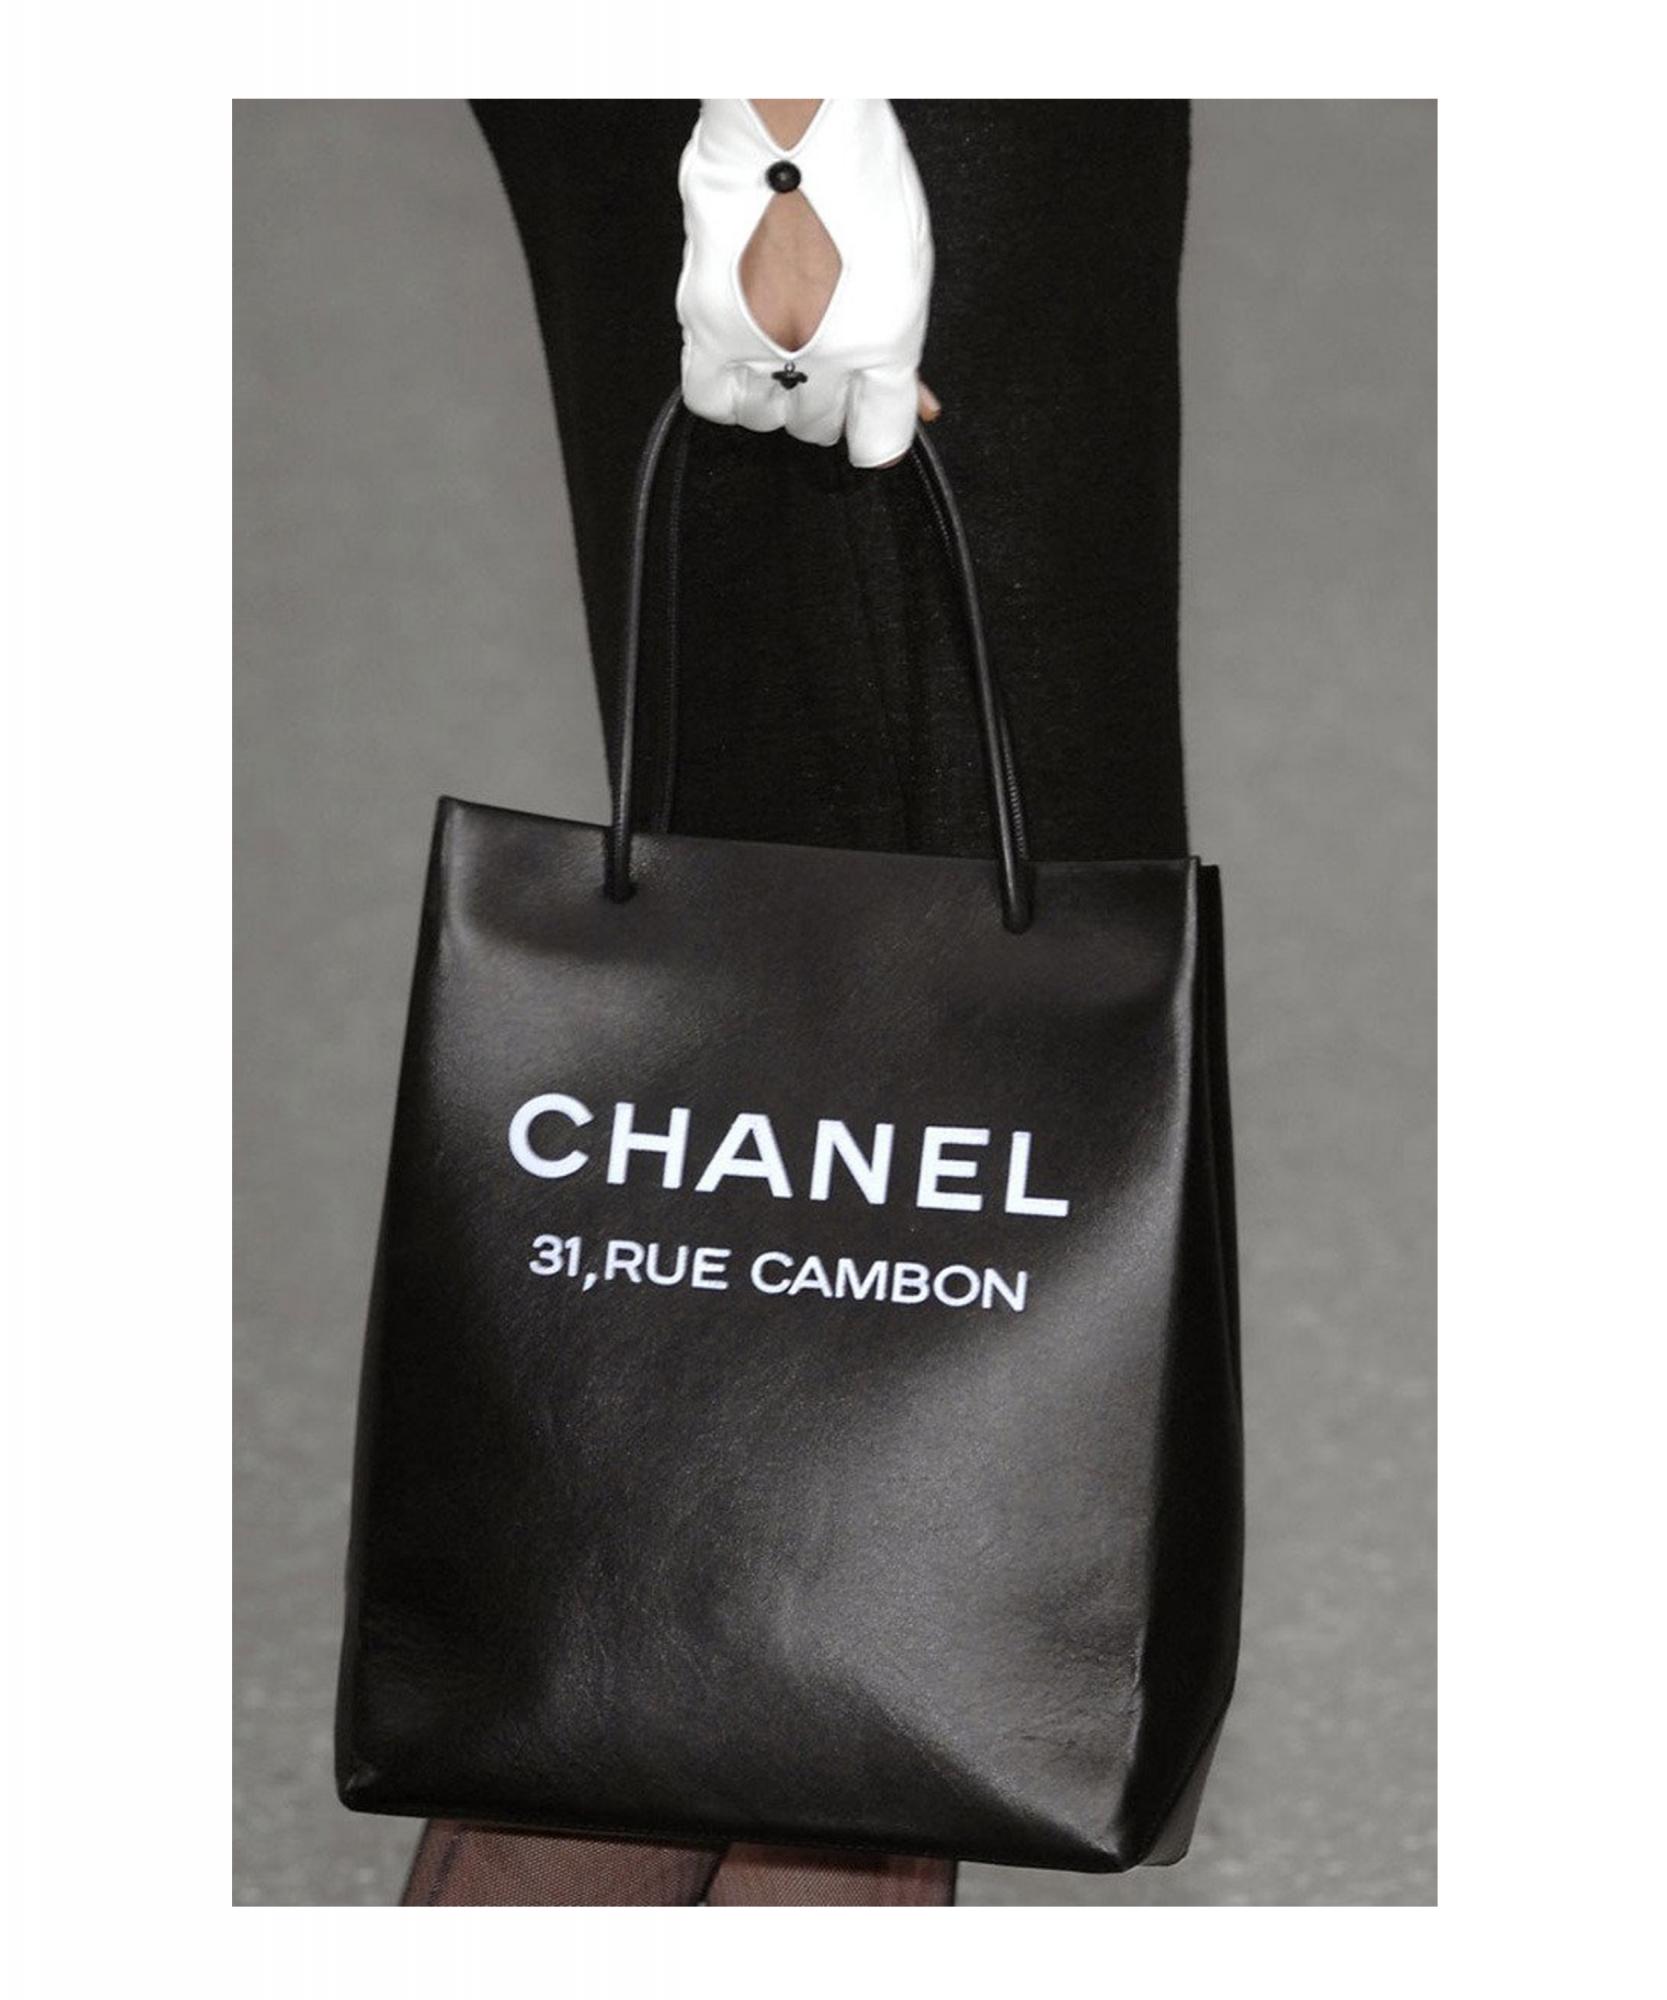 e55c9bc37648 Chanel Black Essential Shopping Tote Medium - Runway | La Doyenne